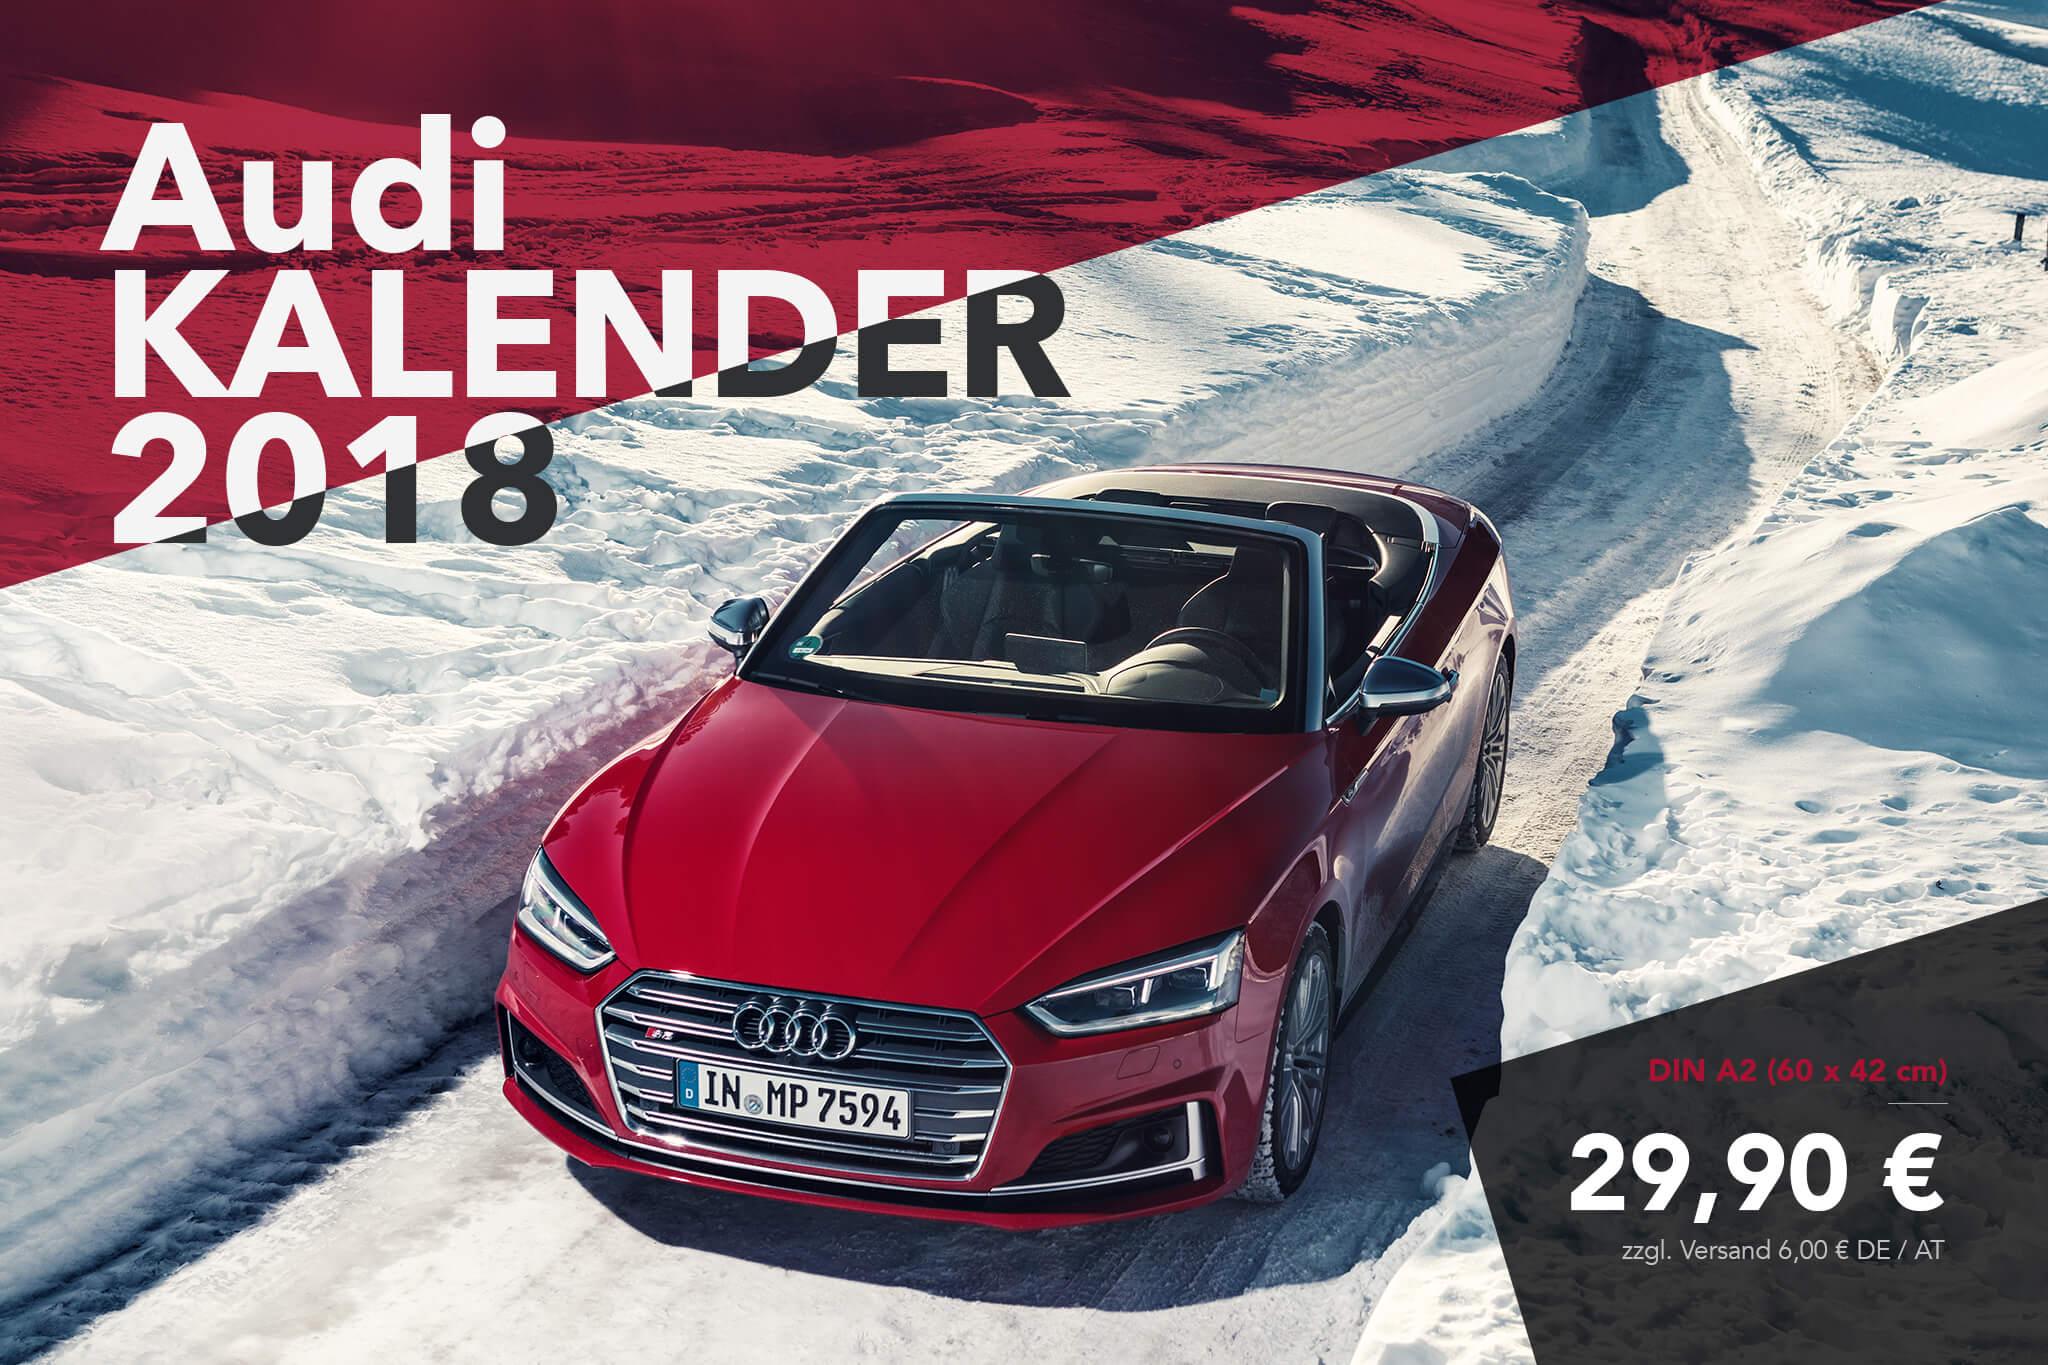 Audi Kalender 2018 - Audi S5 Cabrio